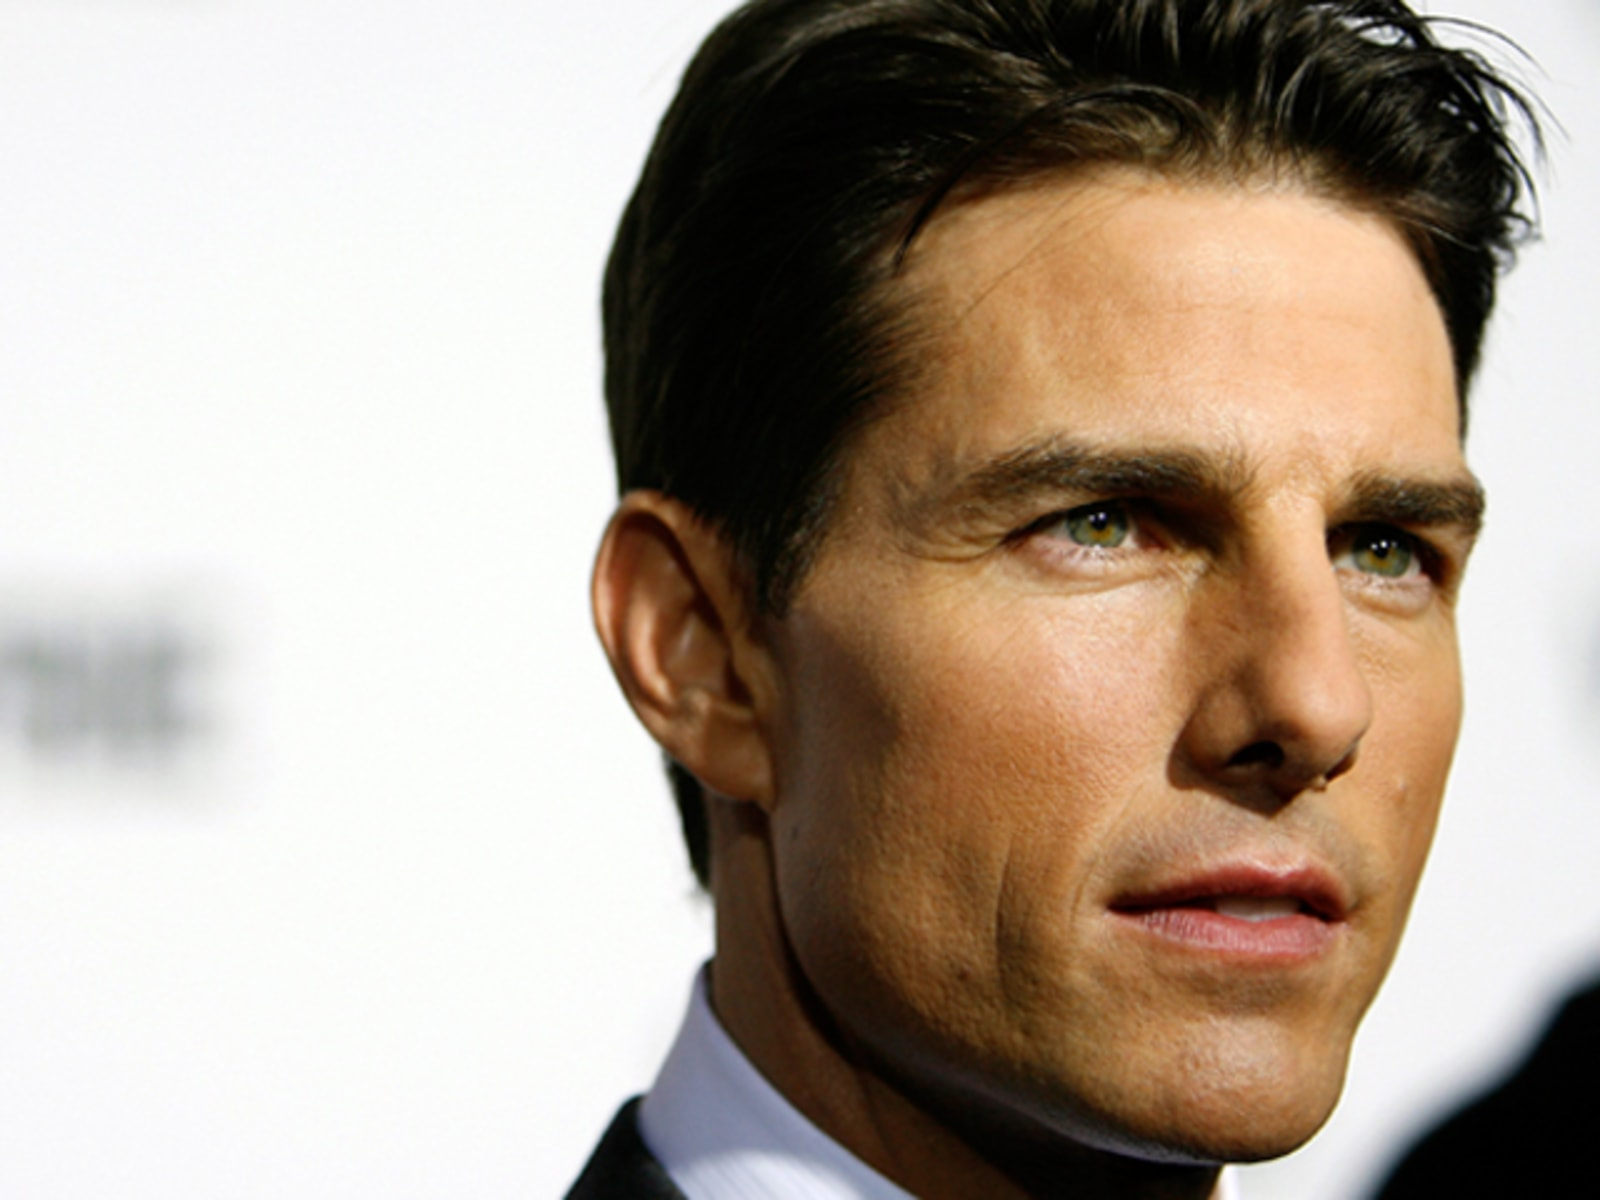 Image: Actor Tom Cruise